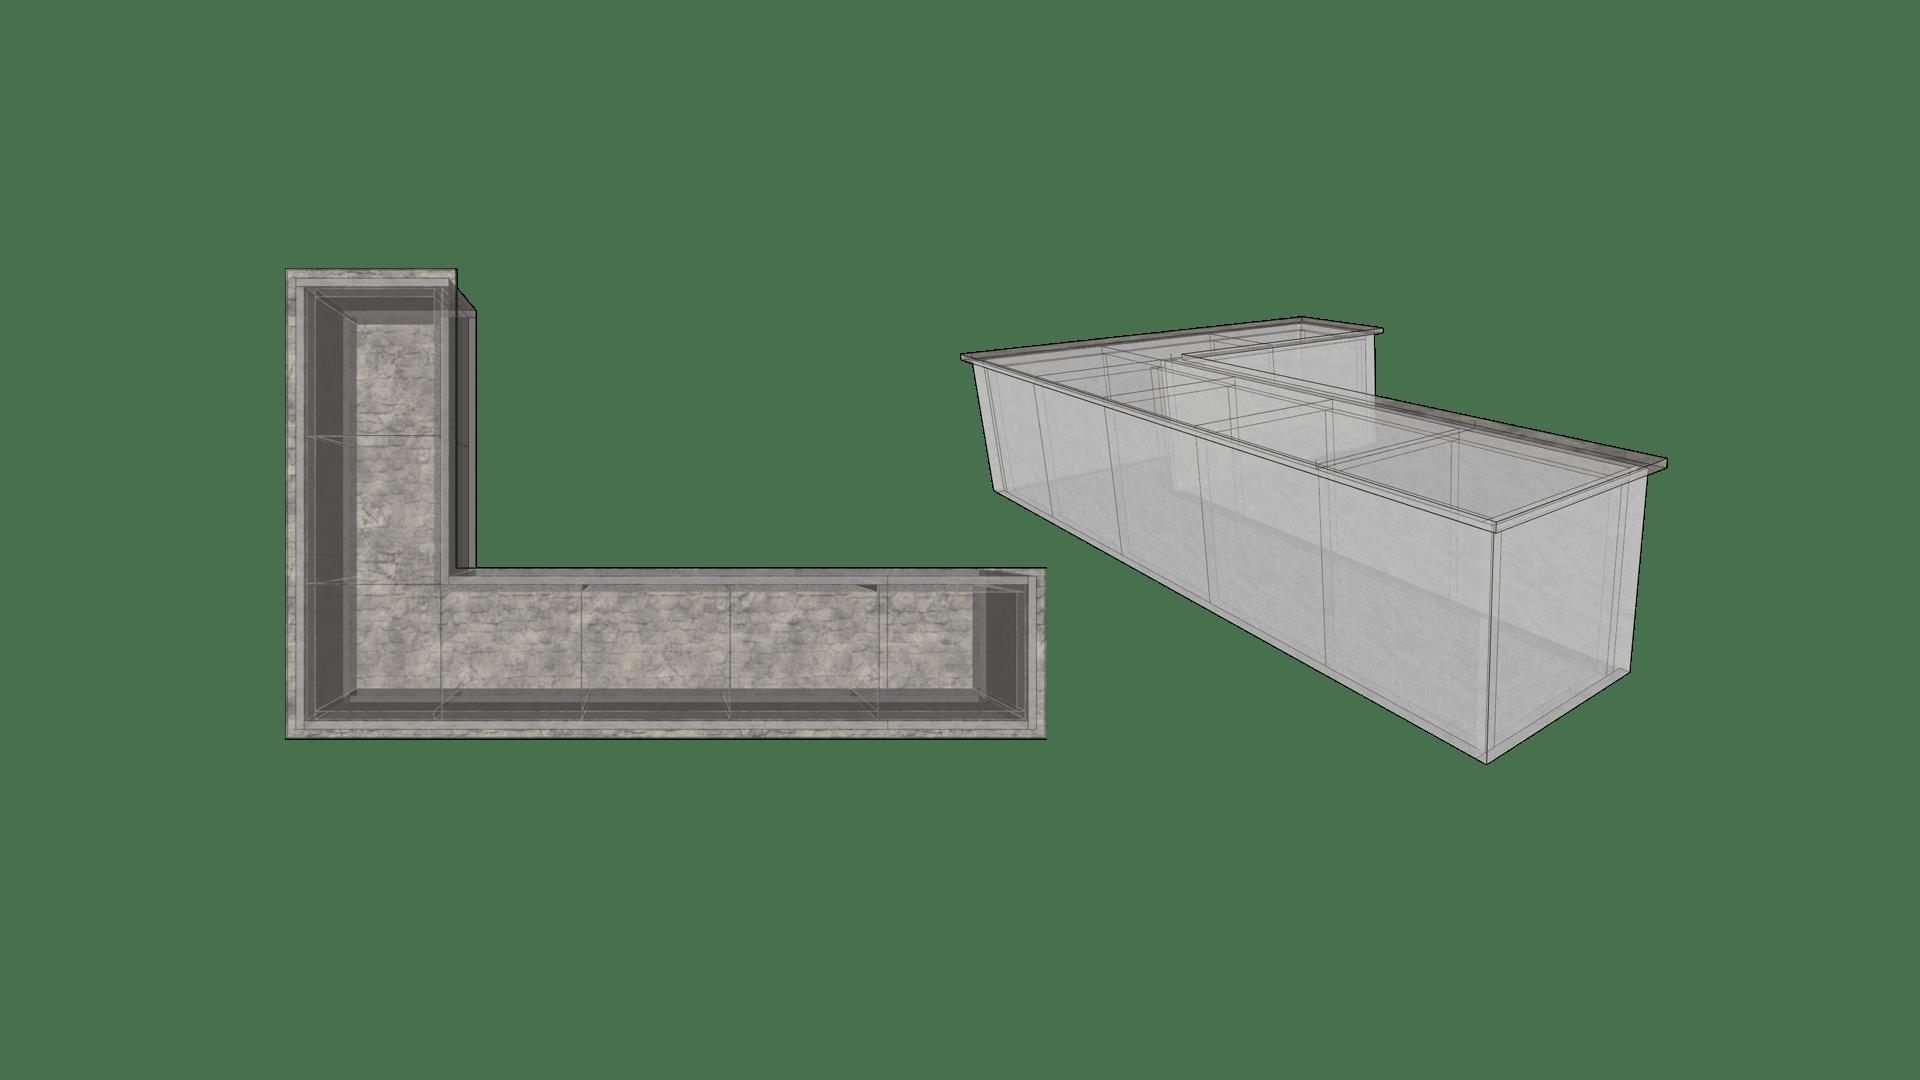 Large L-Shaped Shape Outdoor Kitchen Layout Configuration